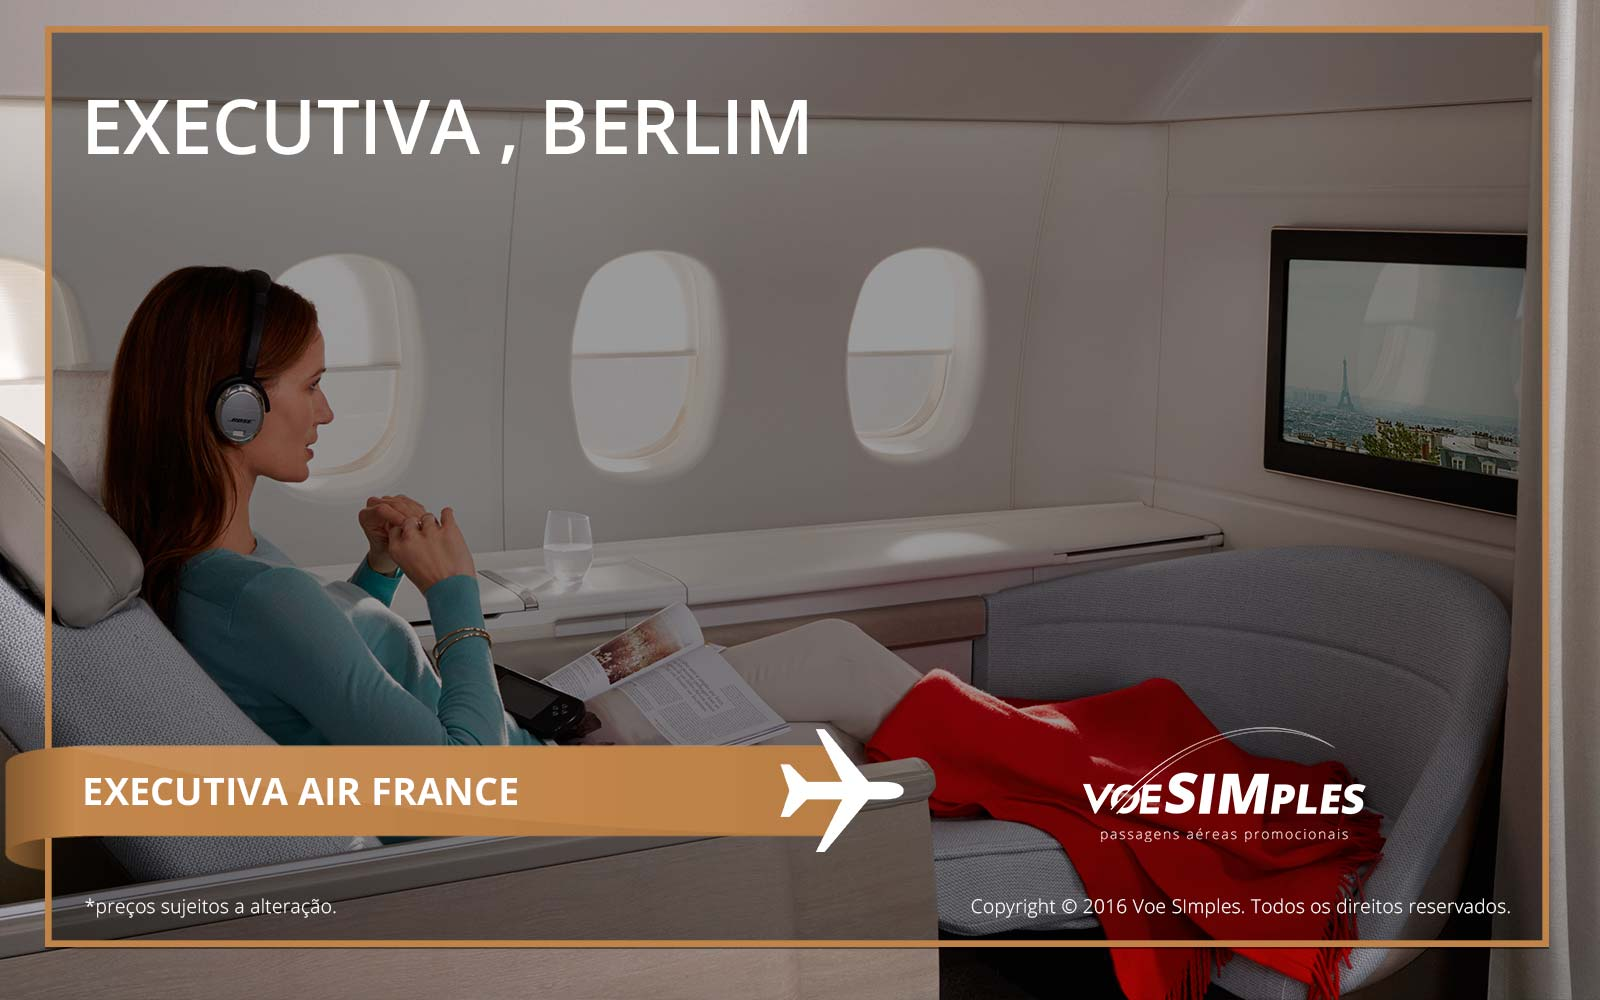 Passagem aérea Classe Executiva Air France para Berlim